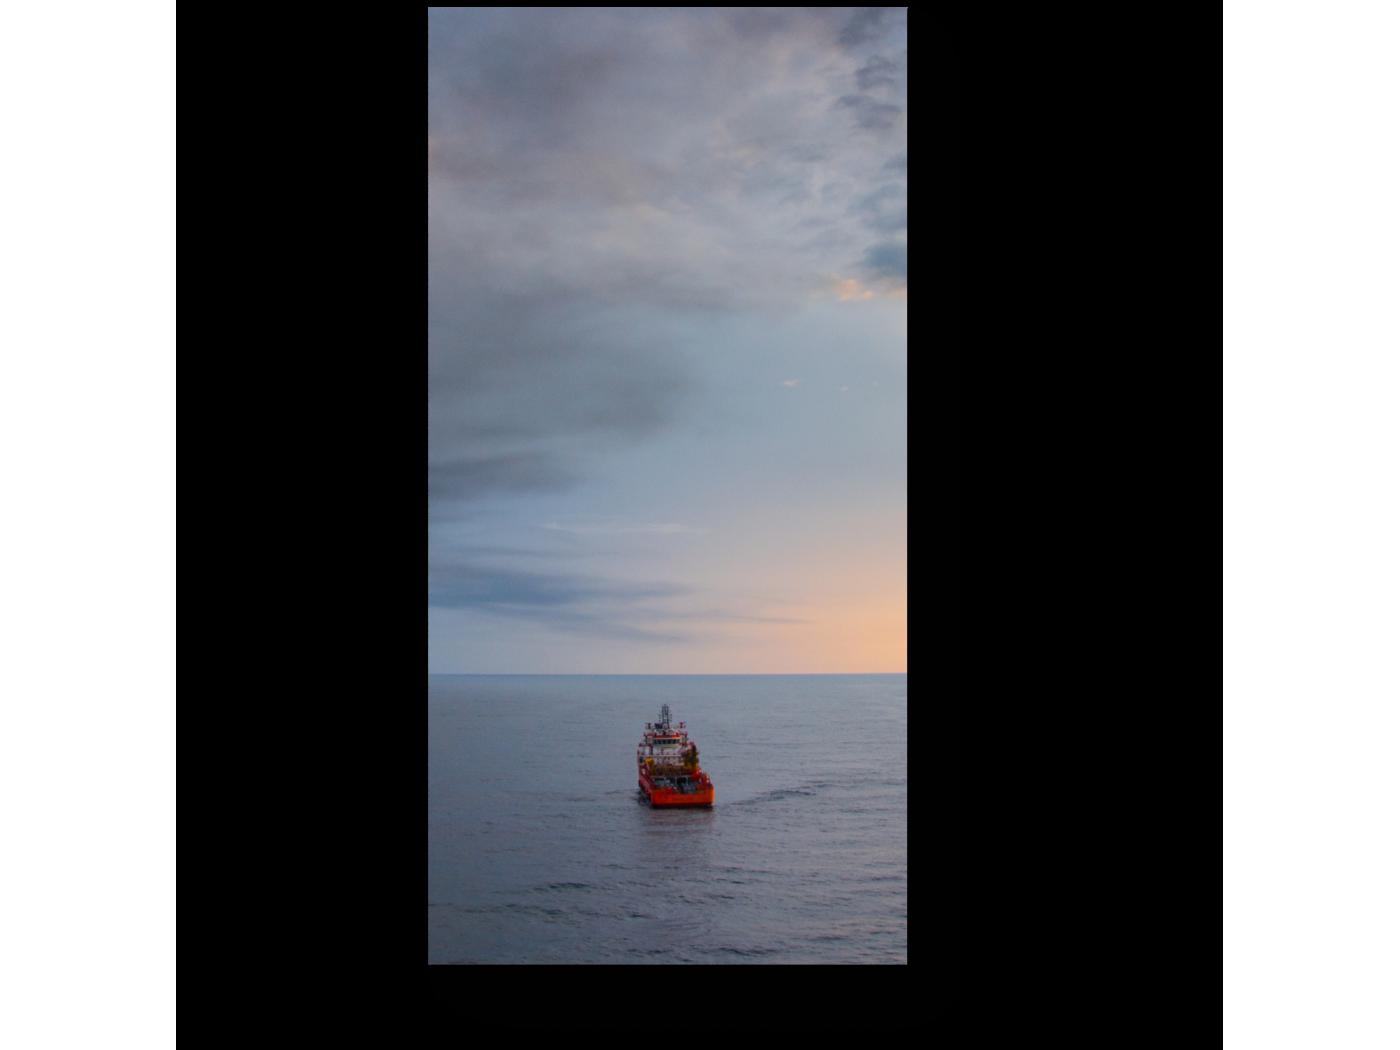 Модульная картина Свободное плавание (20x40) фото